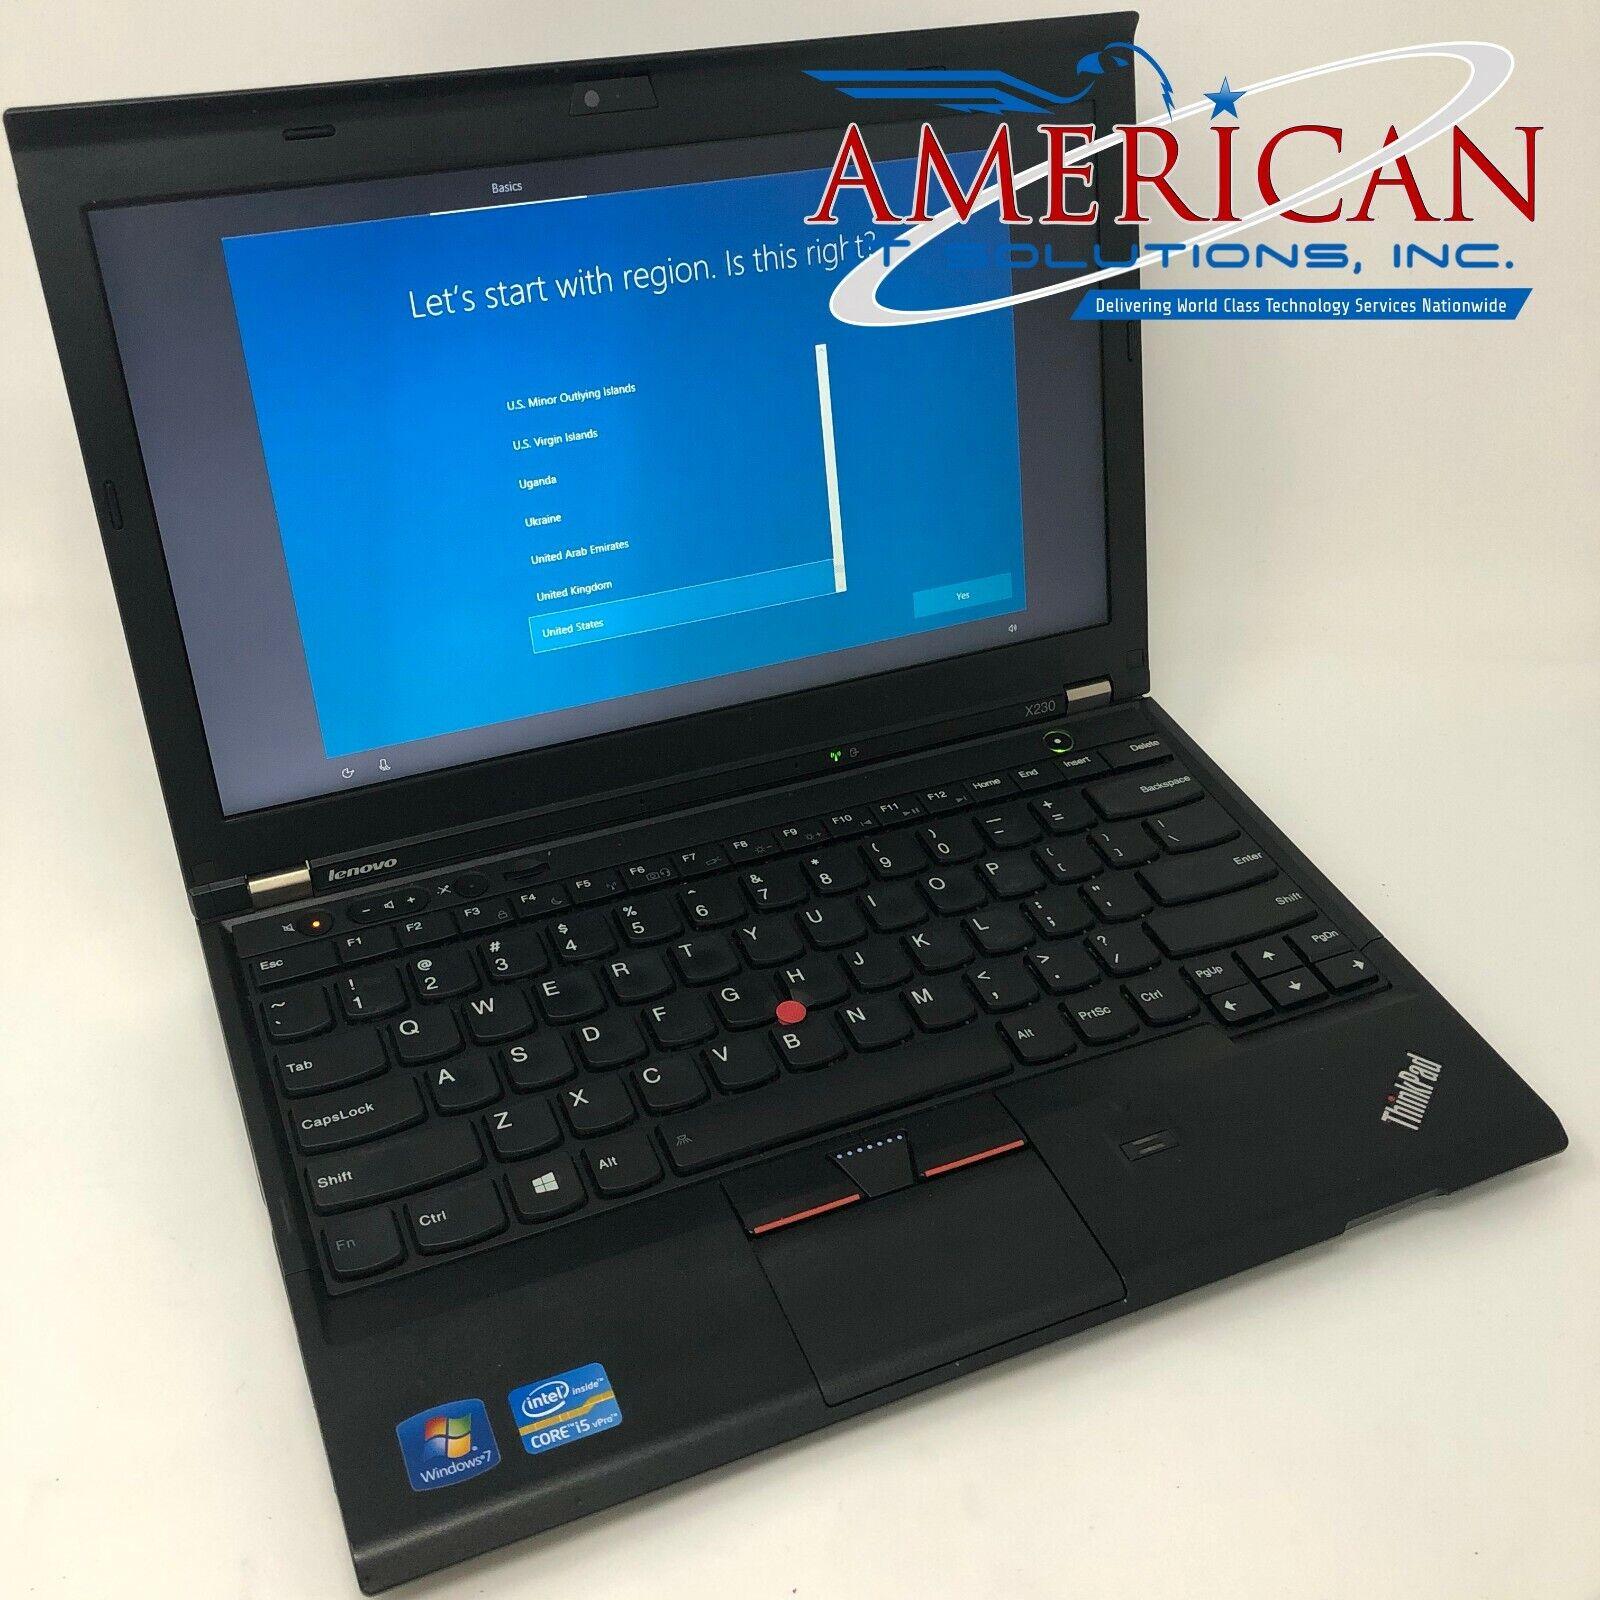 Laptop Windows - Lenovo X230 - Core i5 @ 2.60GHz - 8GB RAM - 128GB SSD - Webcam - Windows 10 Pro